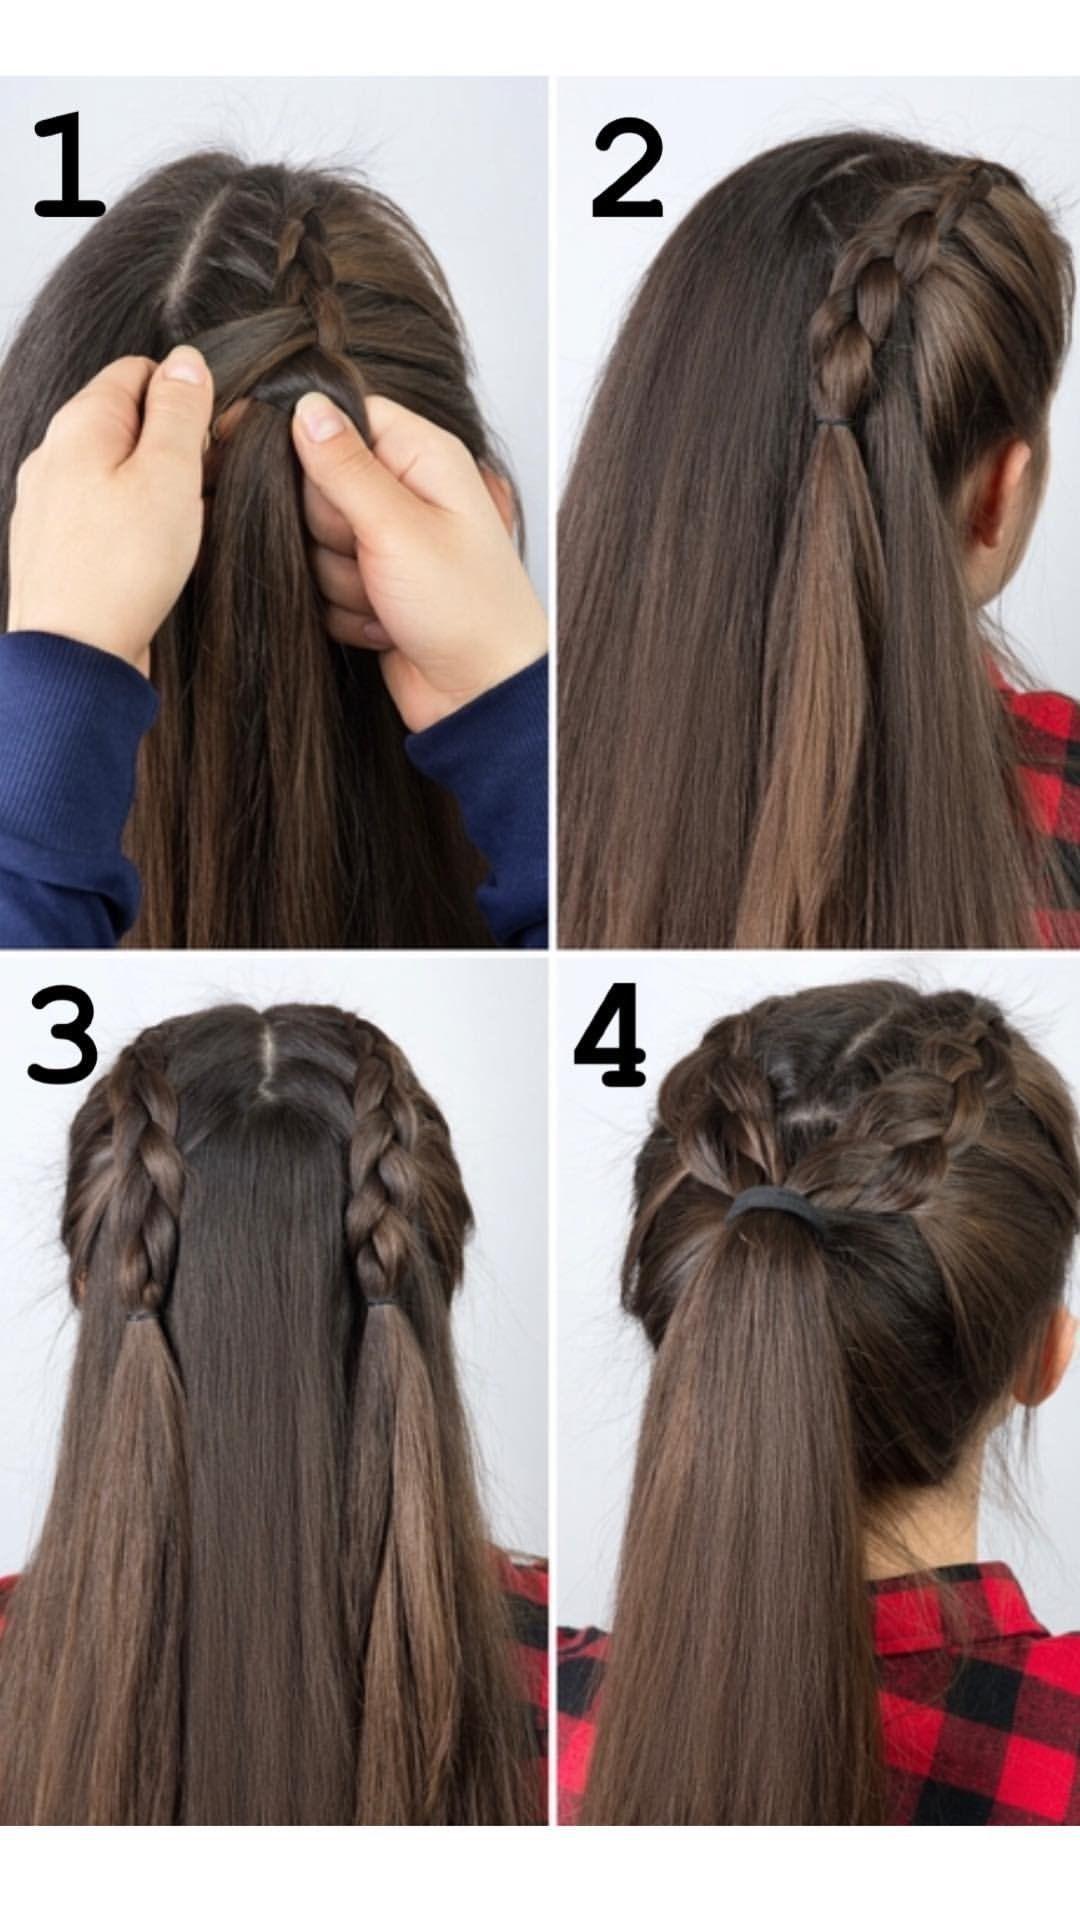 Peinados Paso A Paso Peinados Con Coleta Peinados Con Cabello Liso Peinados Con Trenzas Faciles